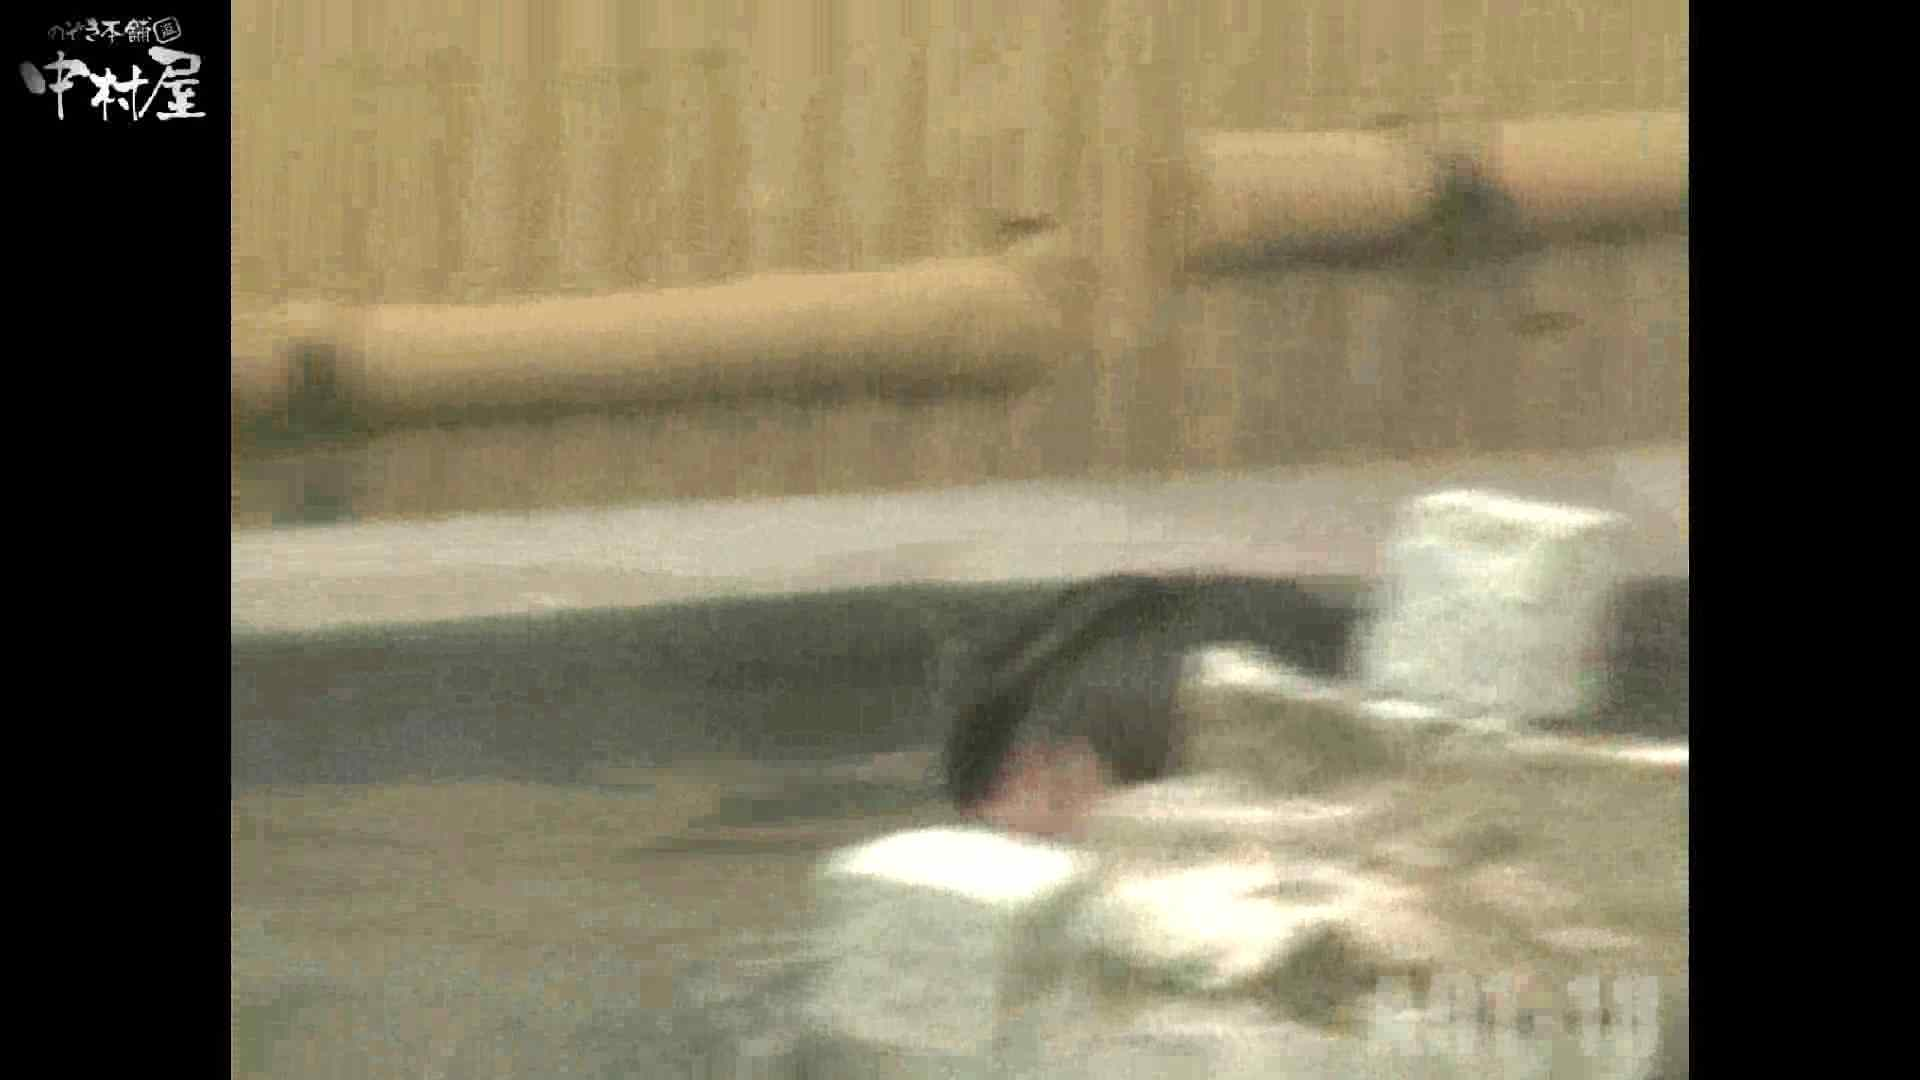 Aquaな露天風呂Vol.882潜入盗撮露天風呂十八判湯 其の七 露天   綺麗なOLたち  80枚 33